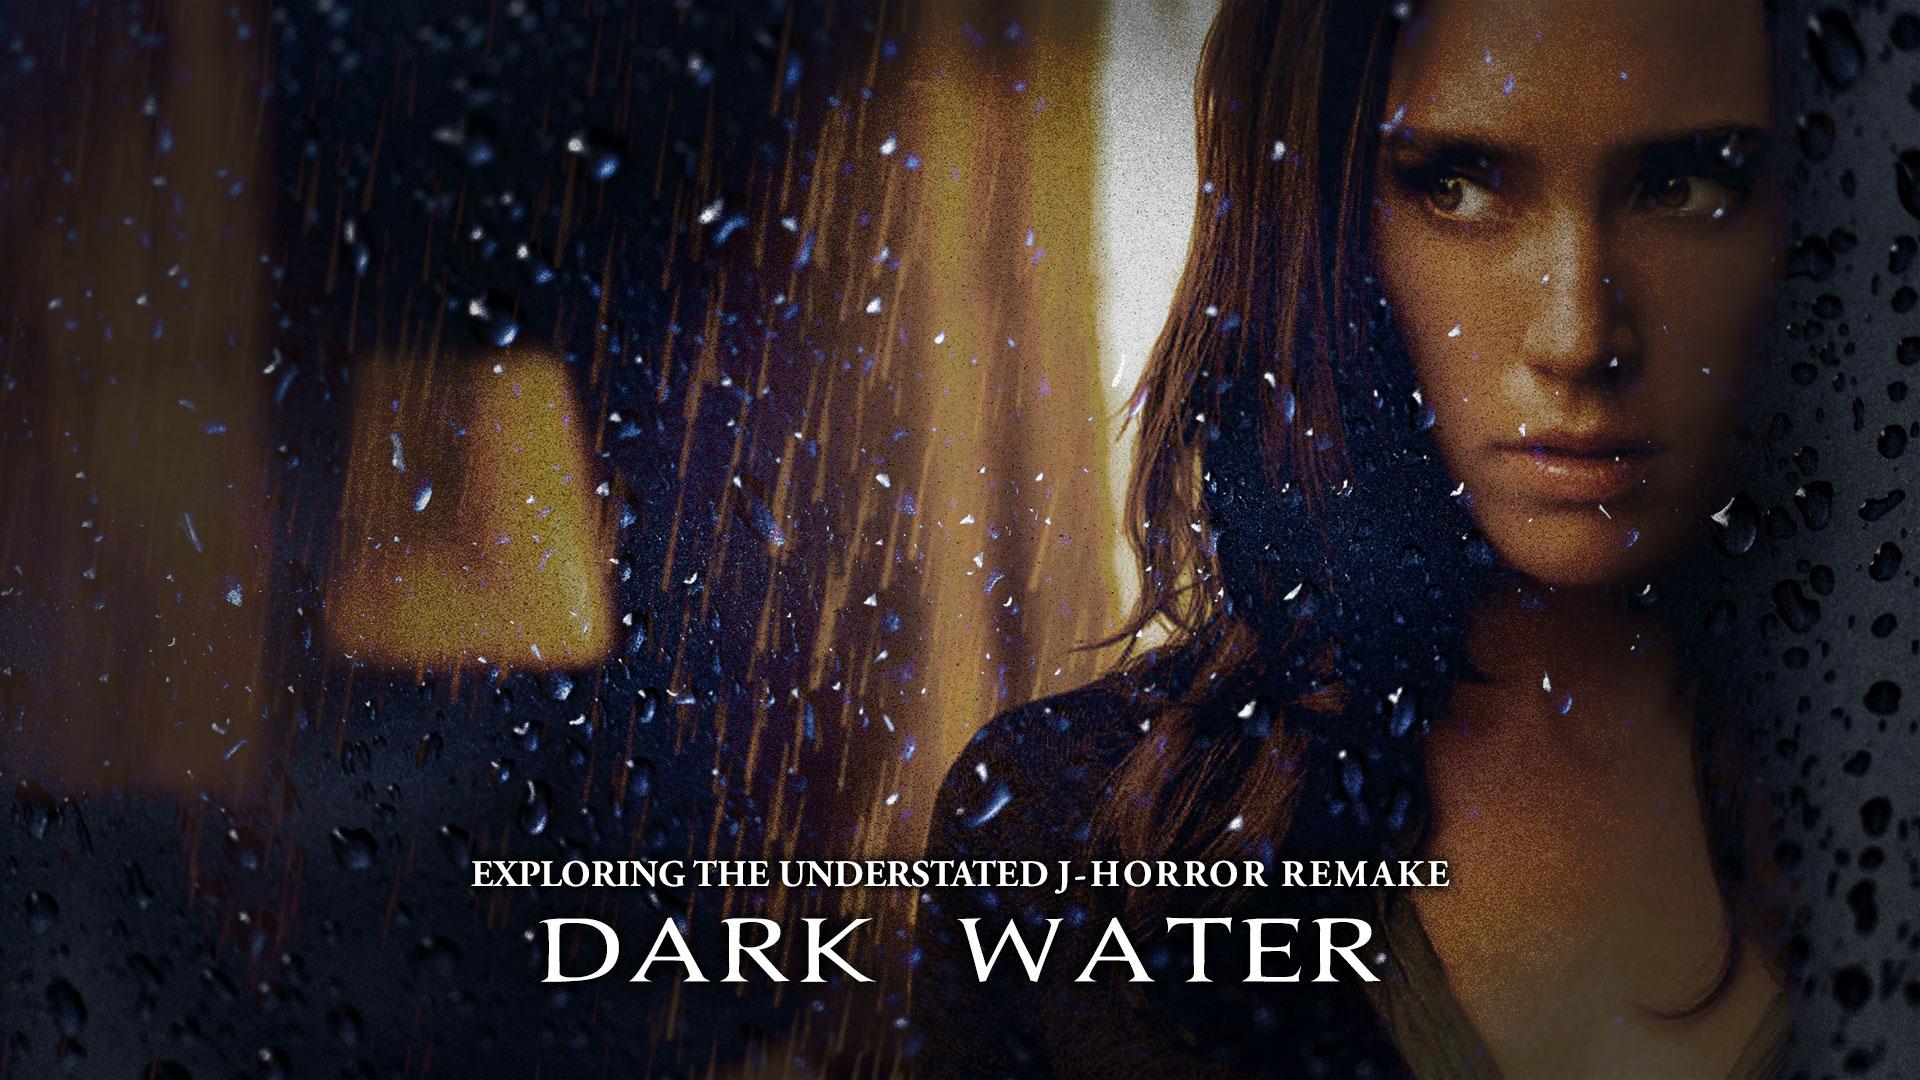 Exploring the Understated J-horror Remake 'Dark Water'